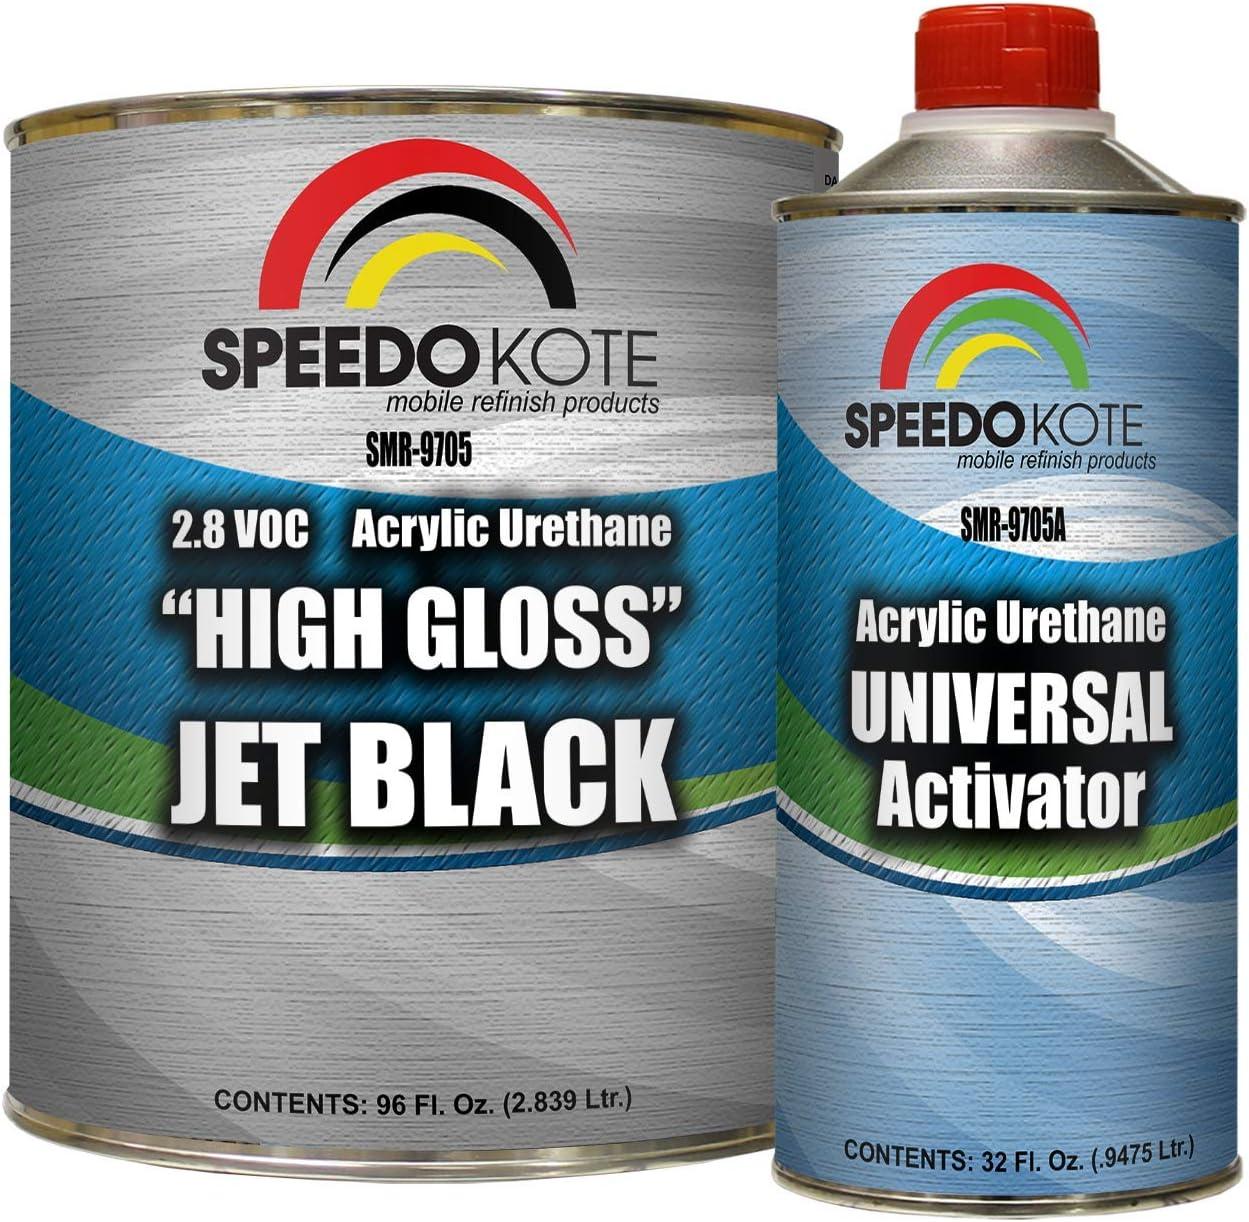 Speedokote High Gloss Jet Black 2K Acrylic Urethane